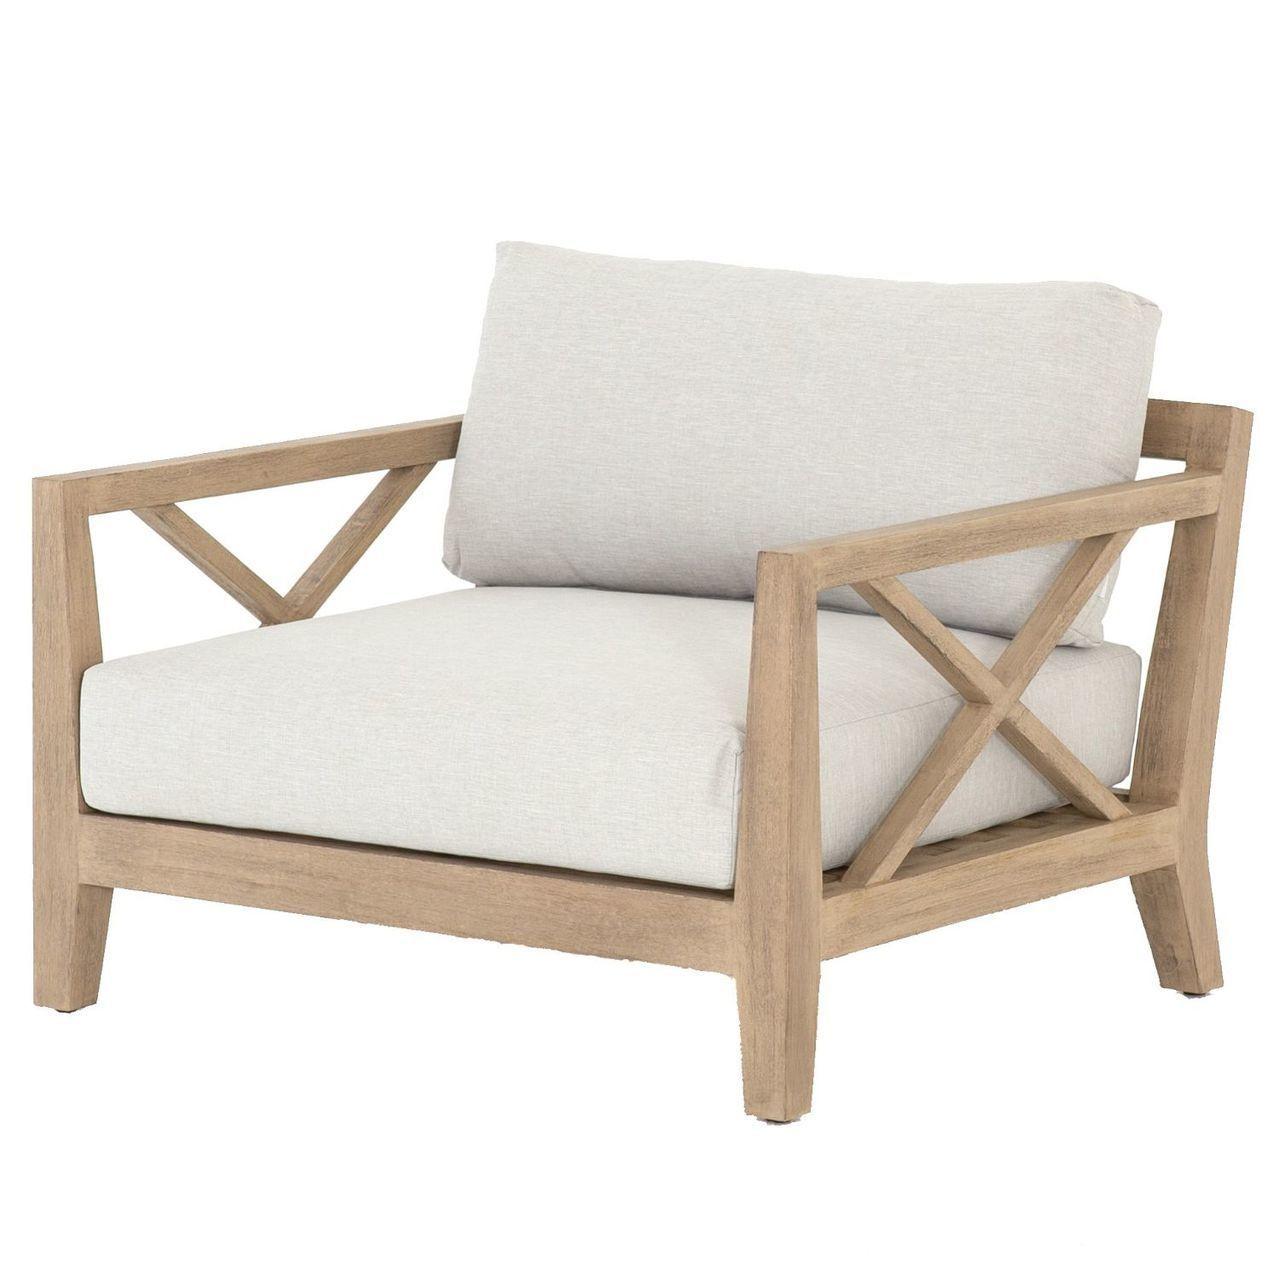 Huntington Natural Teak Outdoor Club Chair Teak Outdoor Furniture Outdoor Chairs Outdoor Furniture